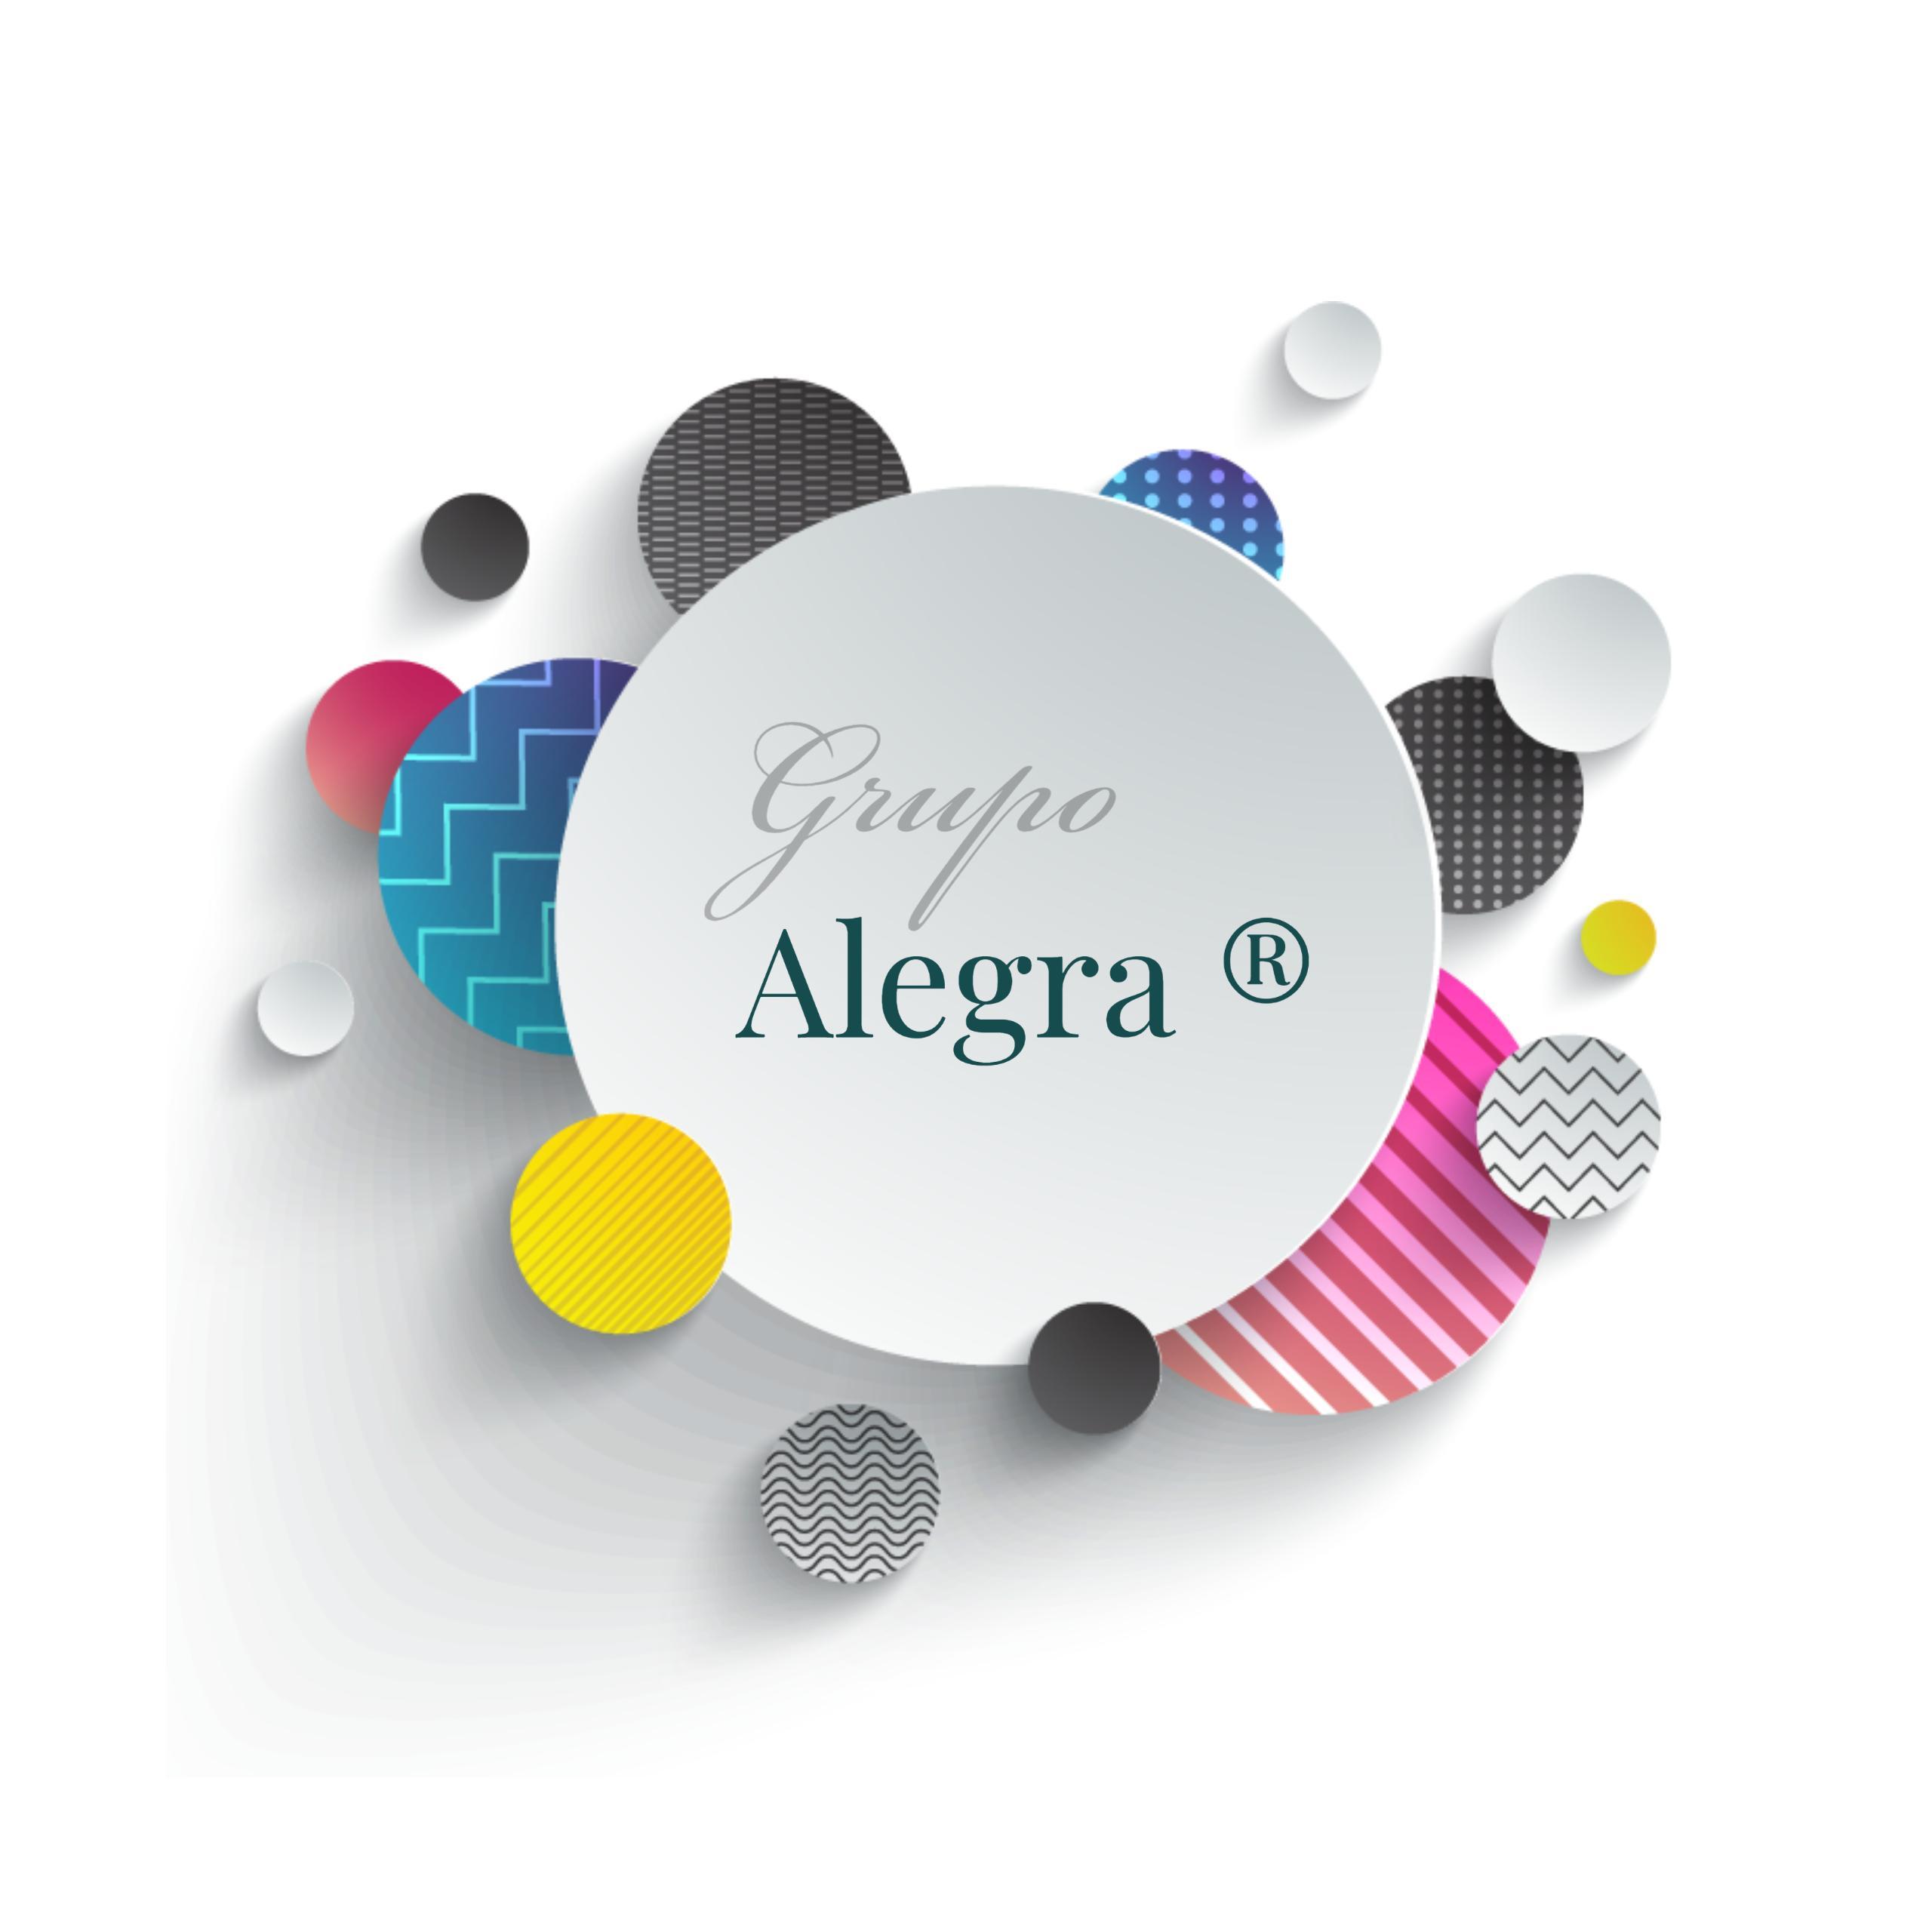 Avatar - Grupo Alegra ®